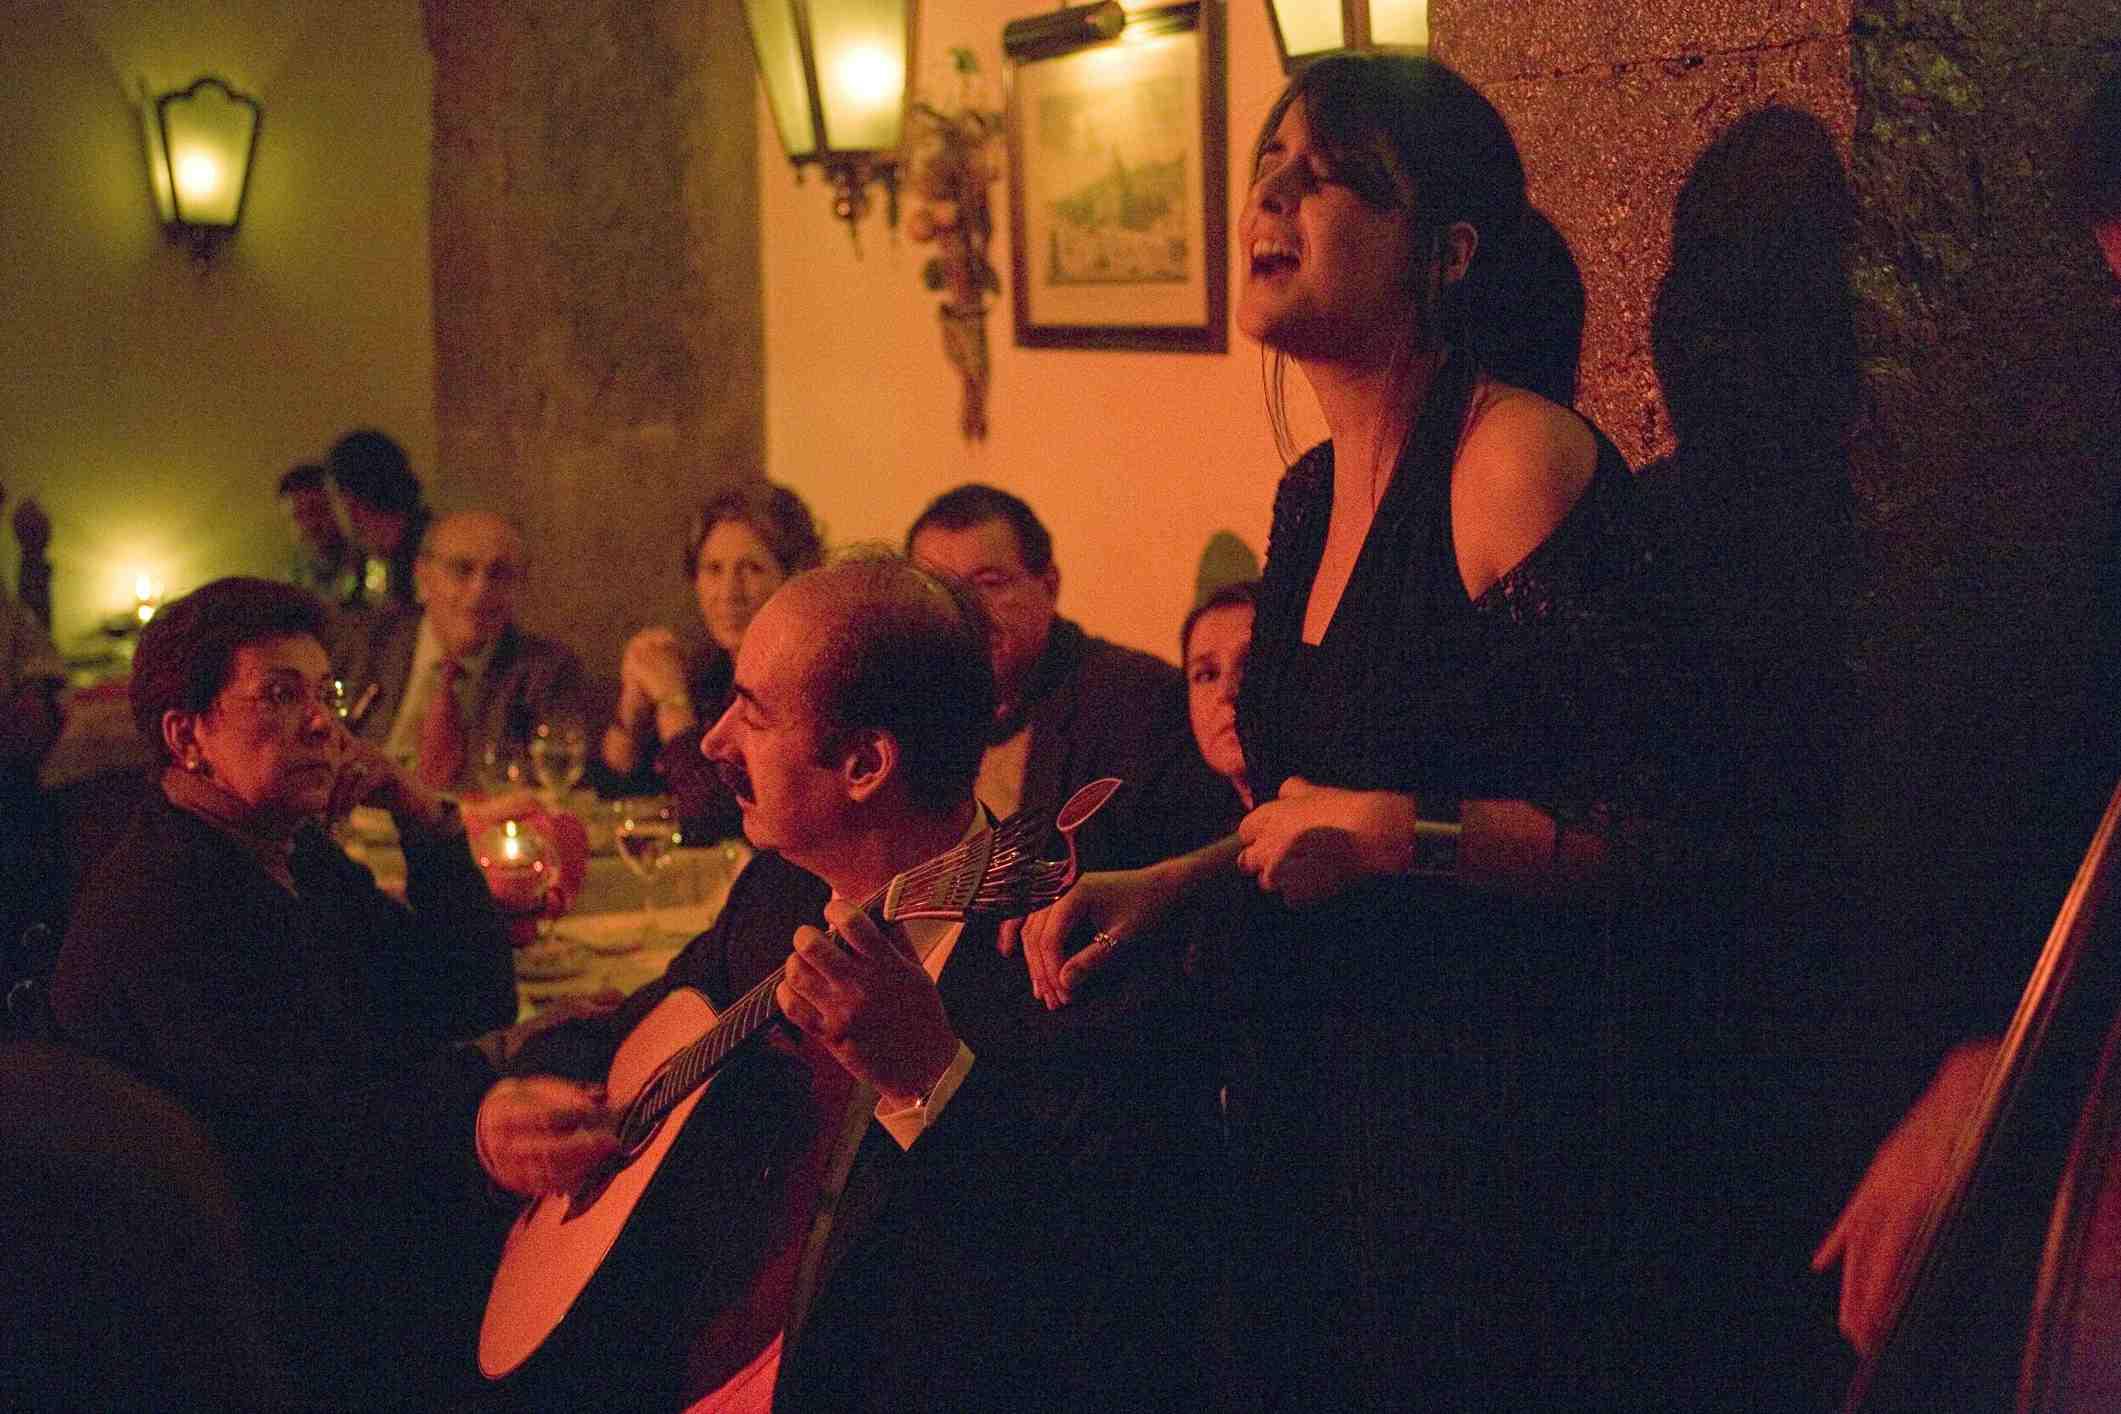 Fado performance in Lisbon